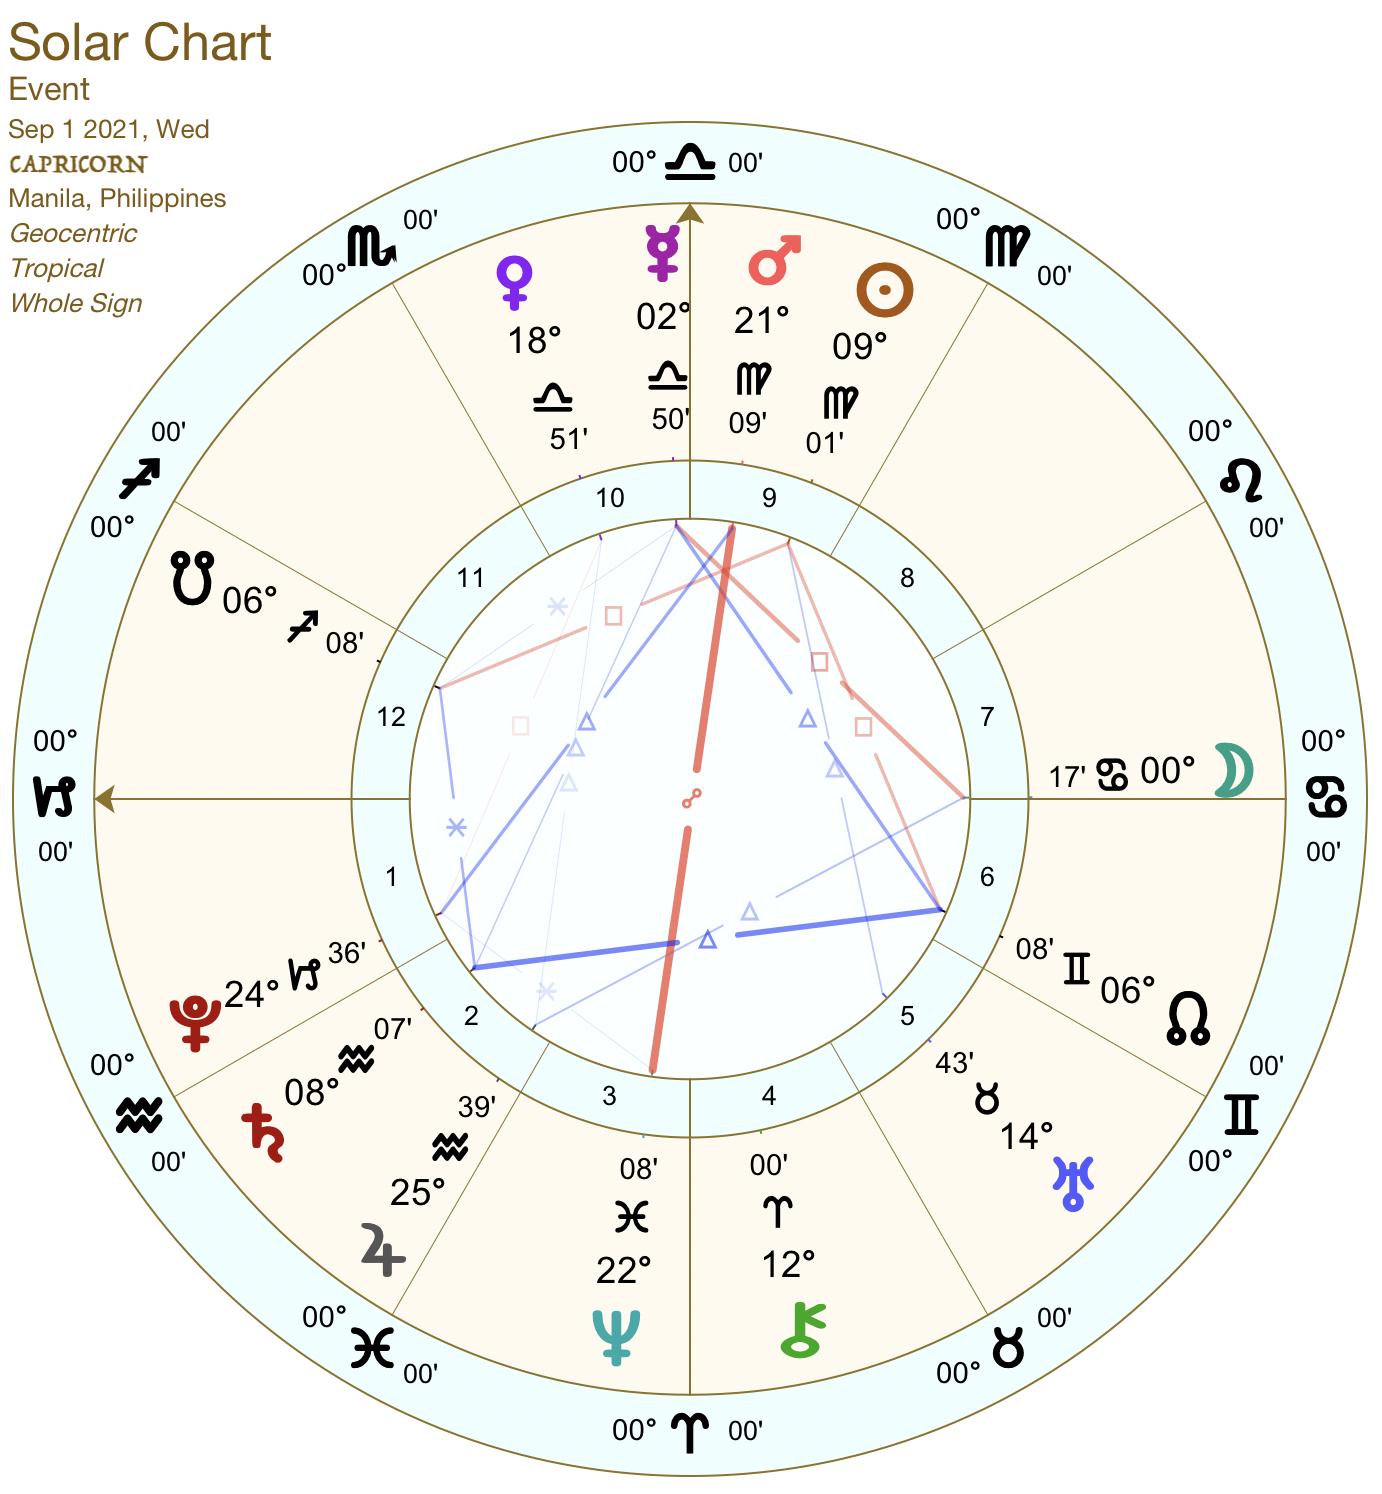 2021 09:Solar Chart:10 Capricorn